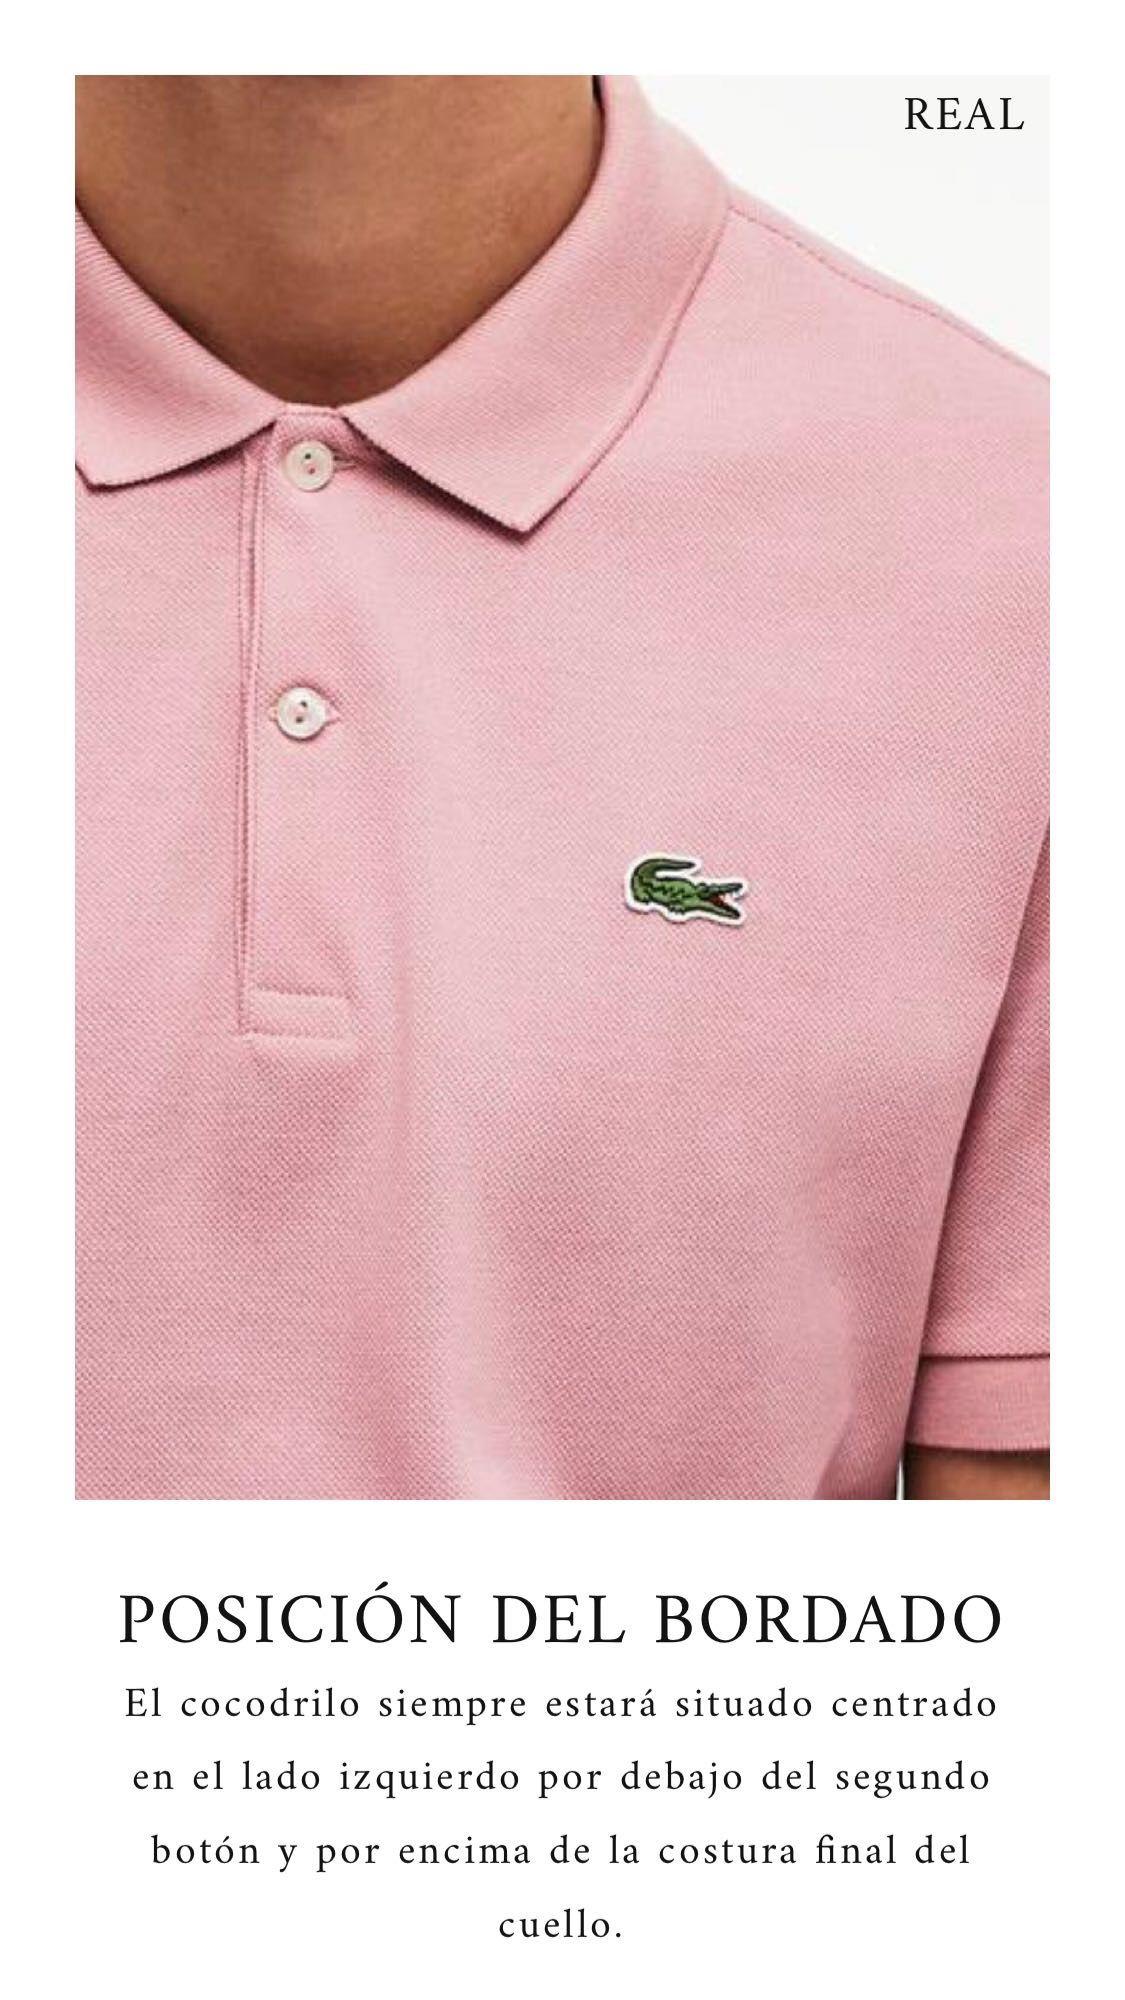 48e41be4acdf Lacoste Polo Shirts Fake Vs Real - BCD Tofu House